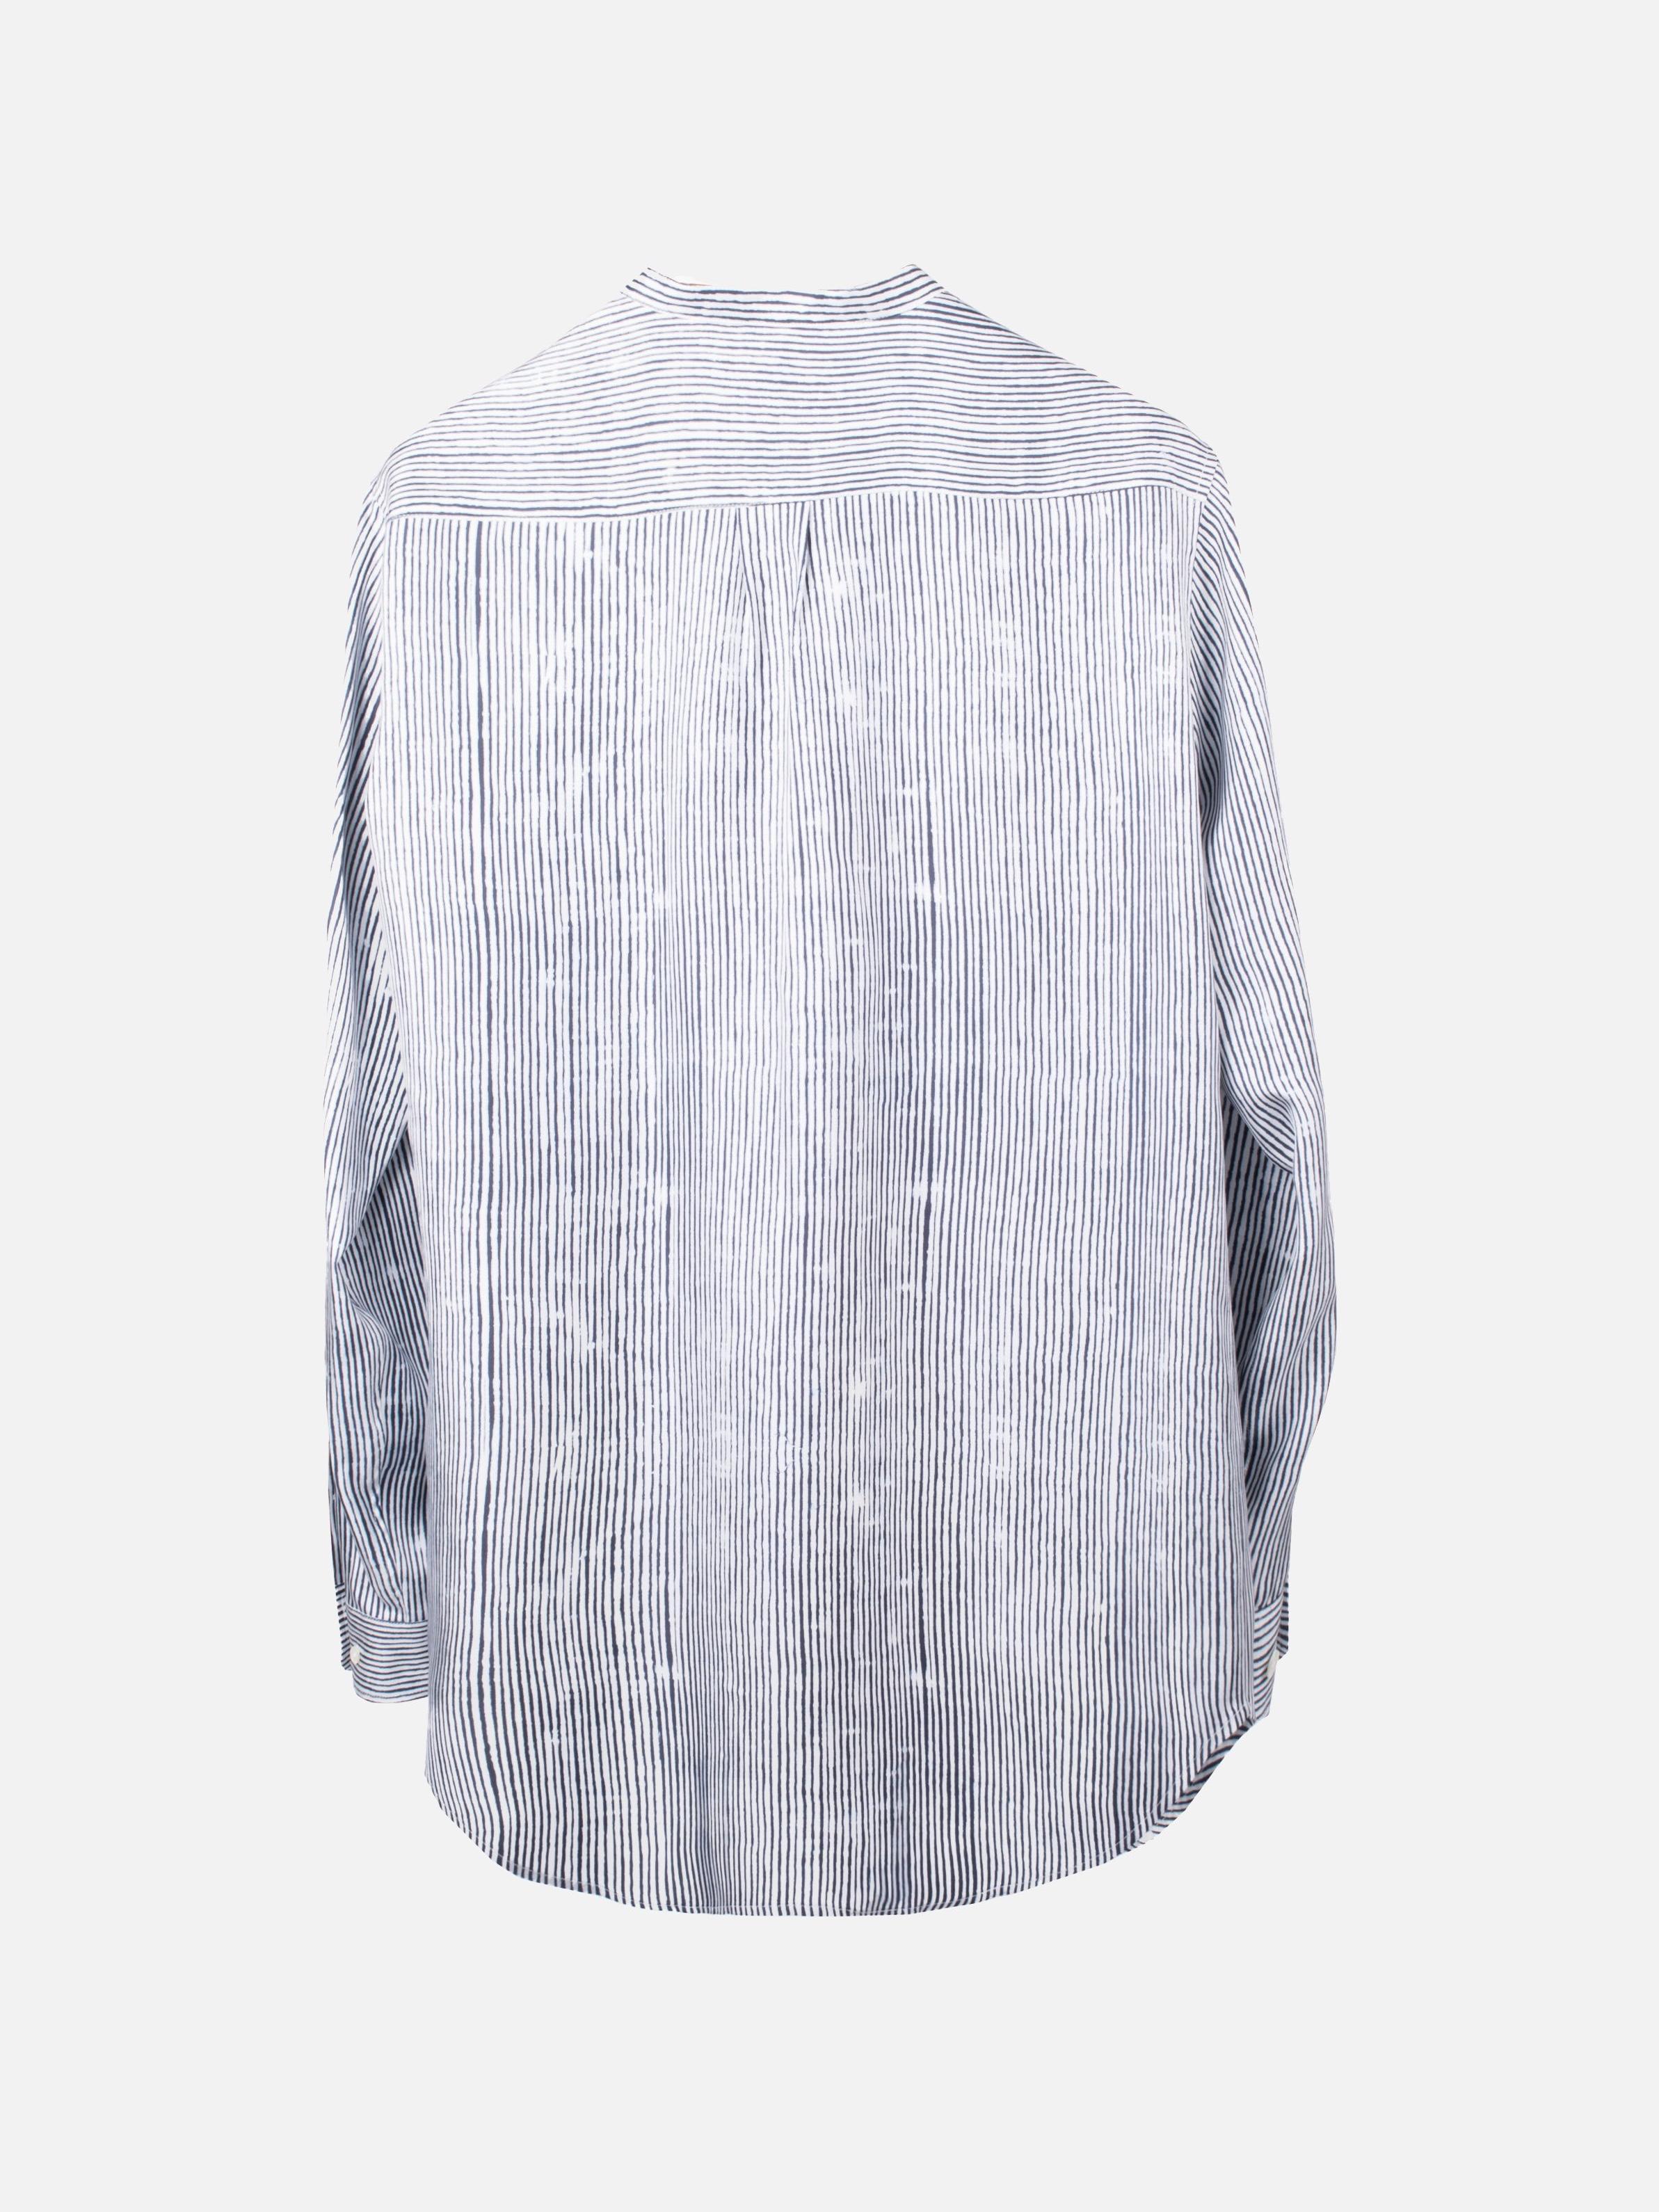 SLIM GRANDAD SHIRT:Bamboo Stripes White5